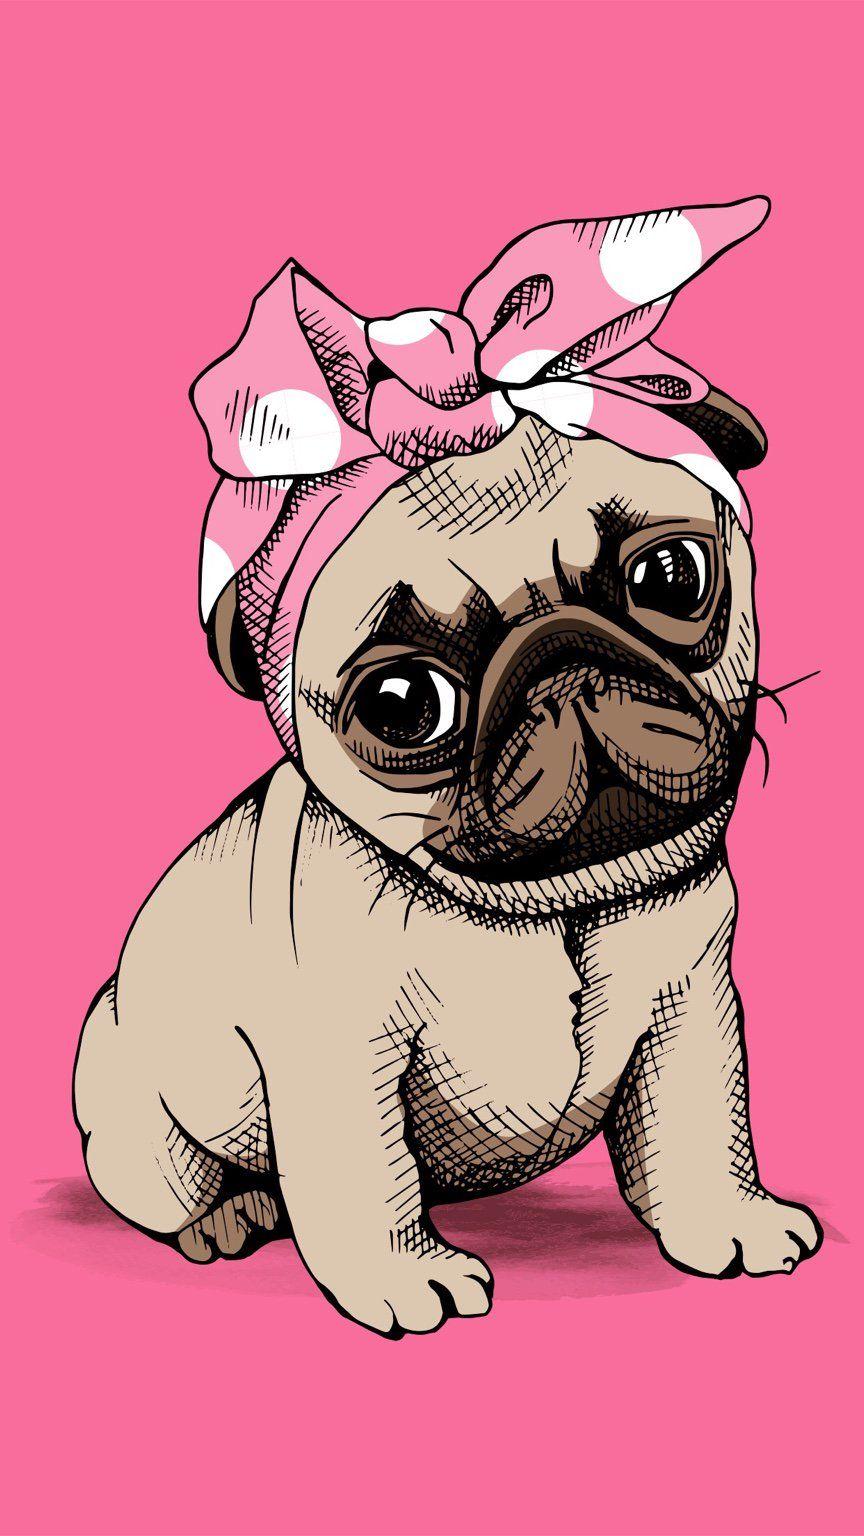 DesPUGito im not a taco im a pugburrito everybody say im smart but im kinda stupido but its ok cuse im super cute